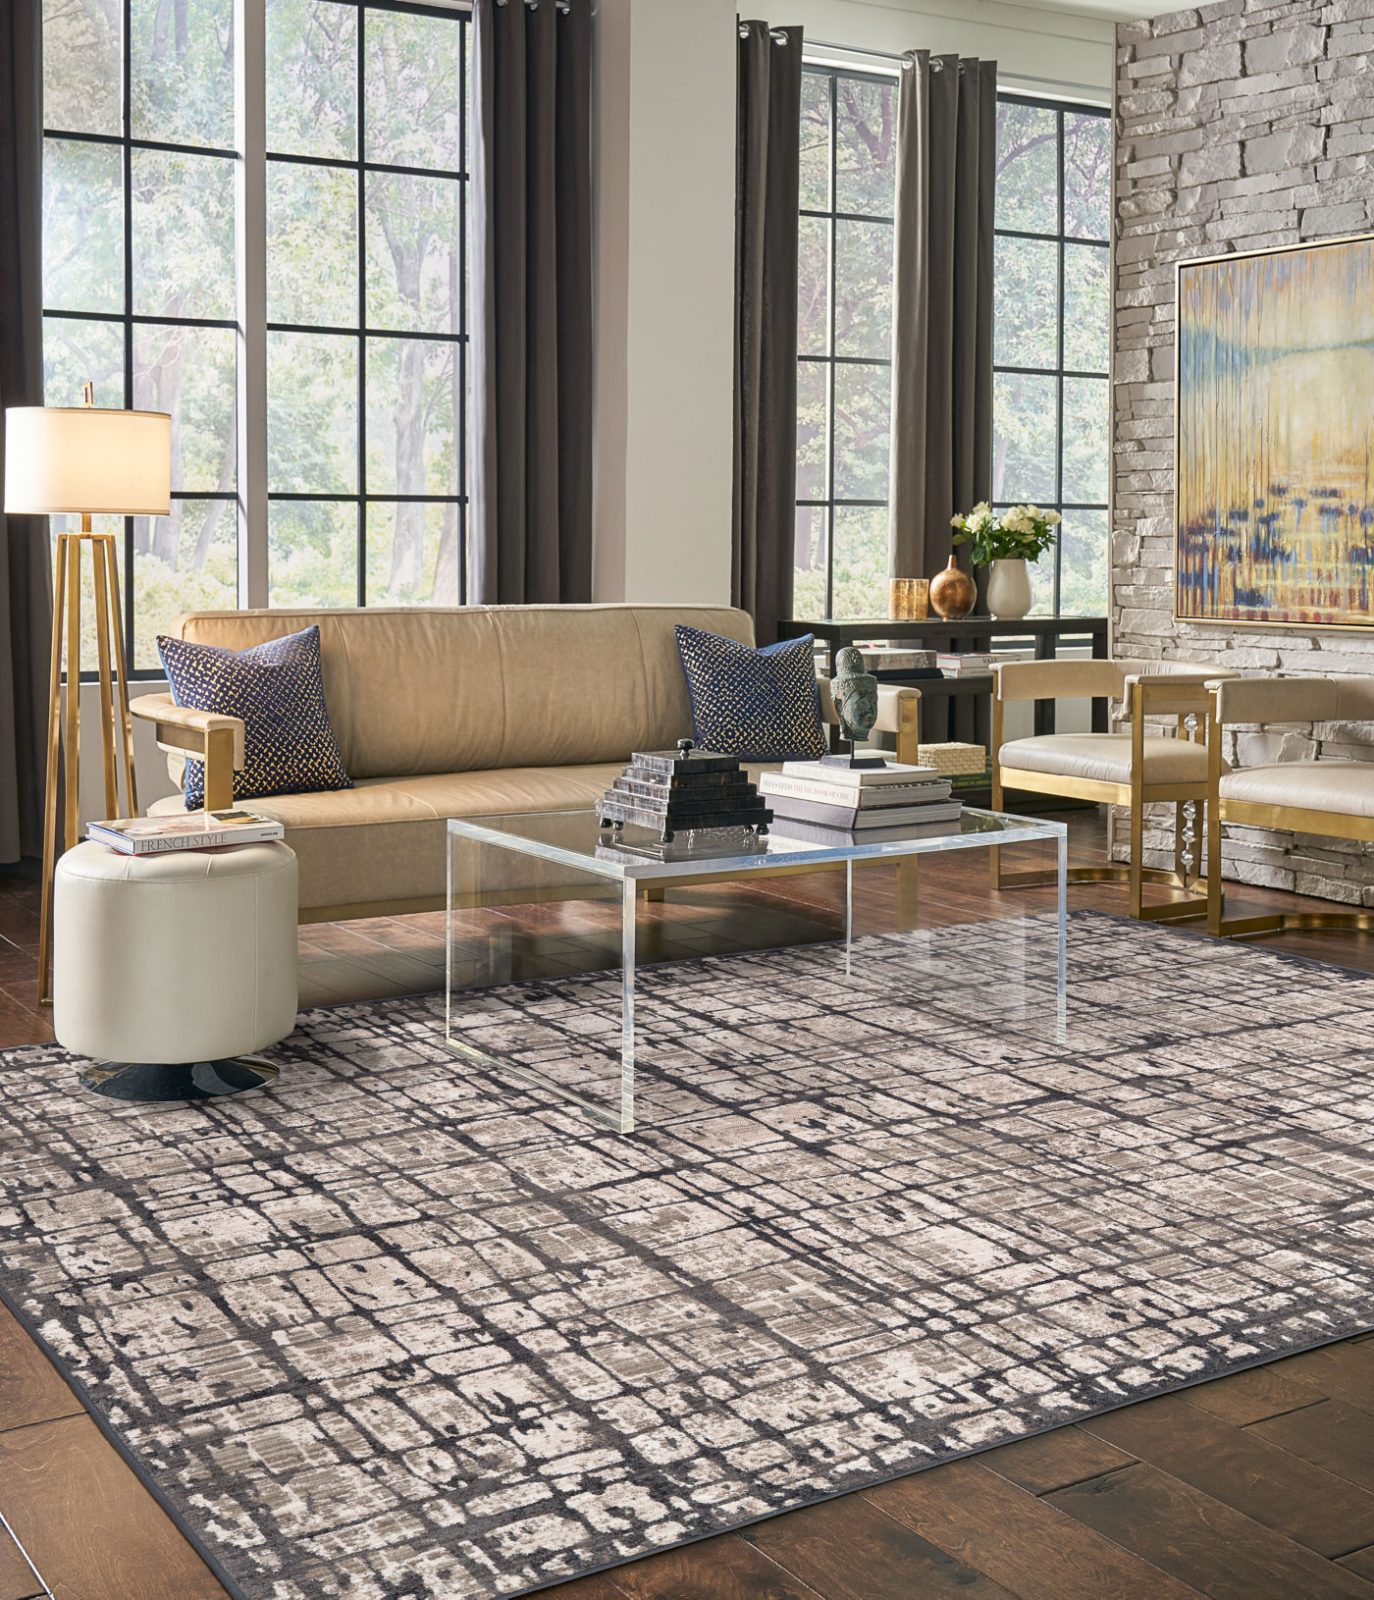 Karastan area rug for living room | Dolphin Carpet & Tile